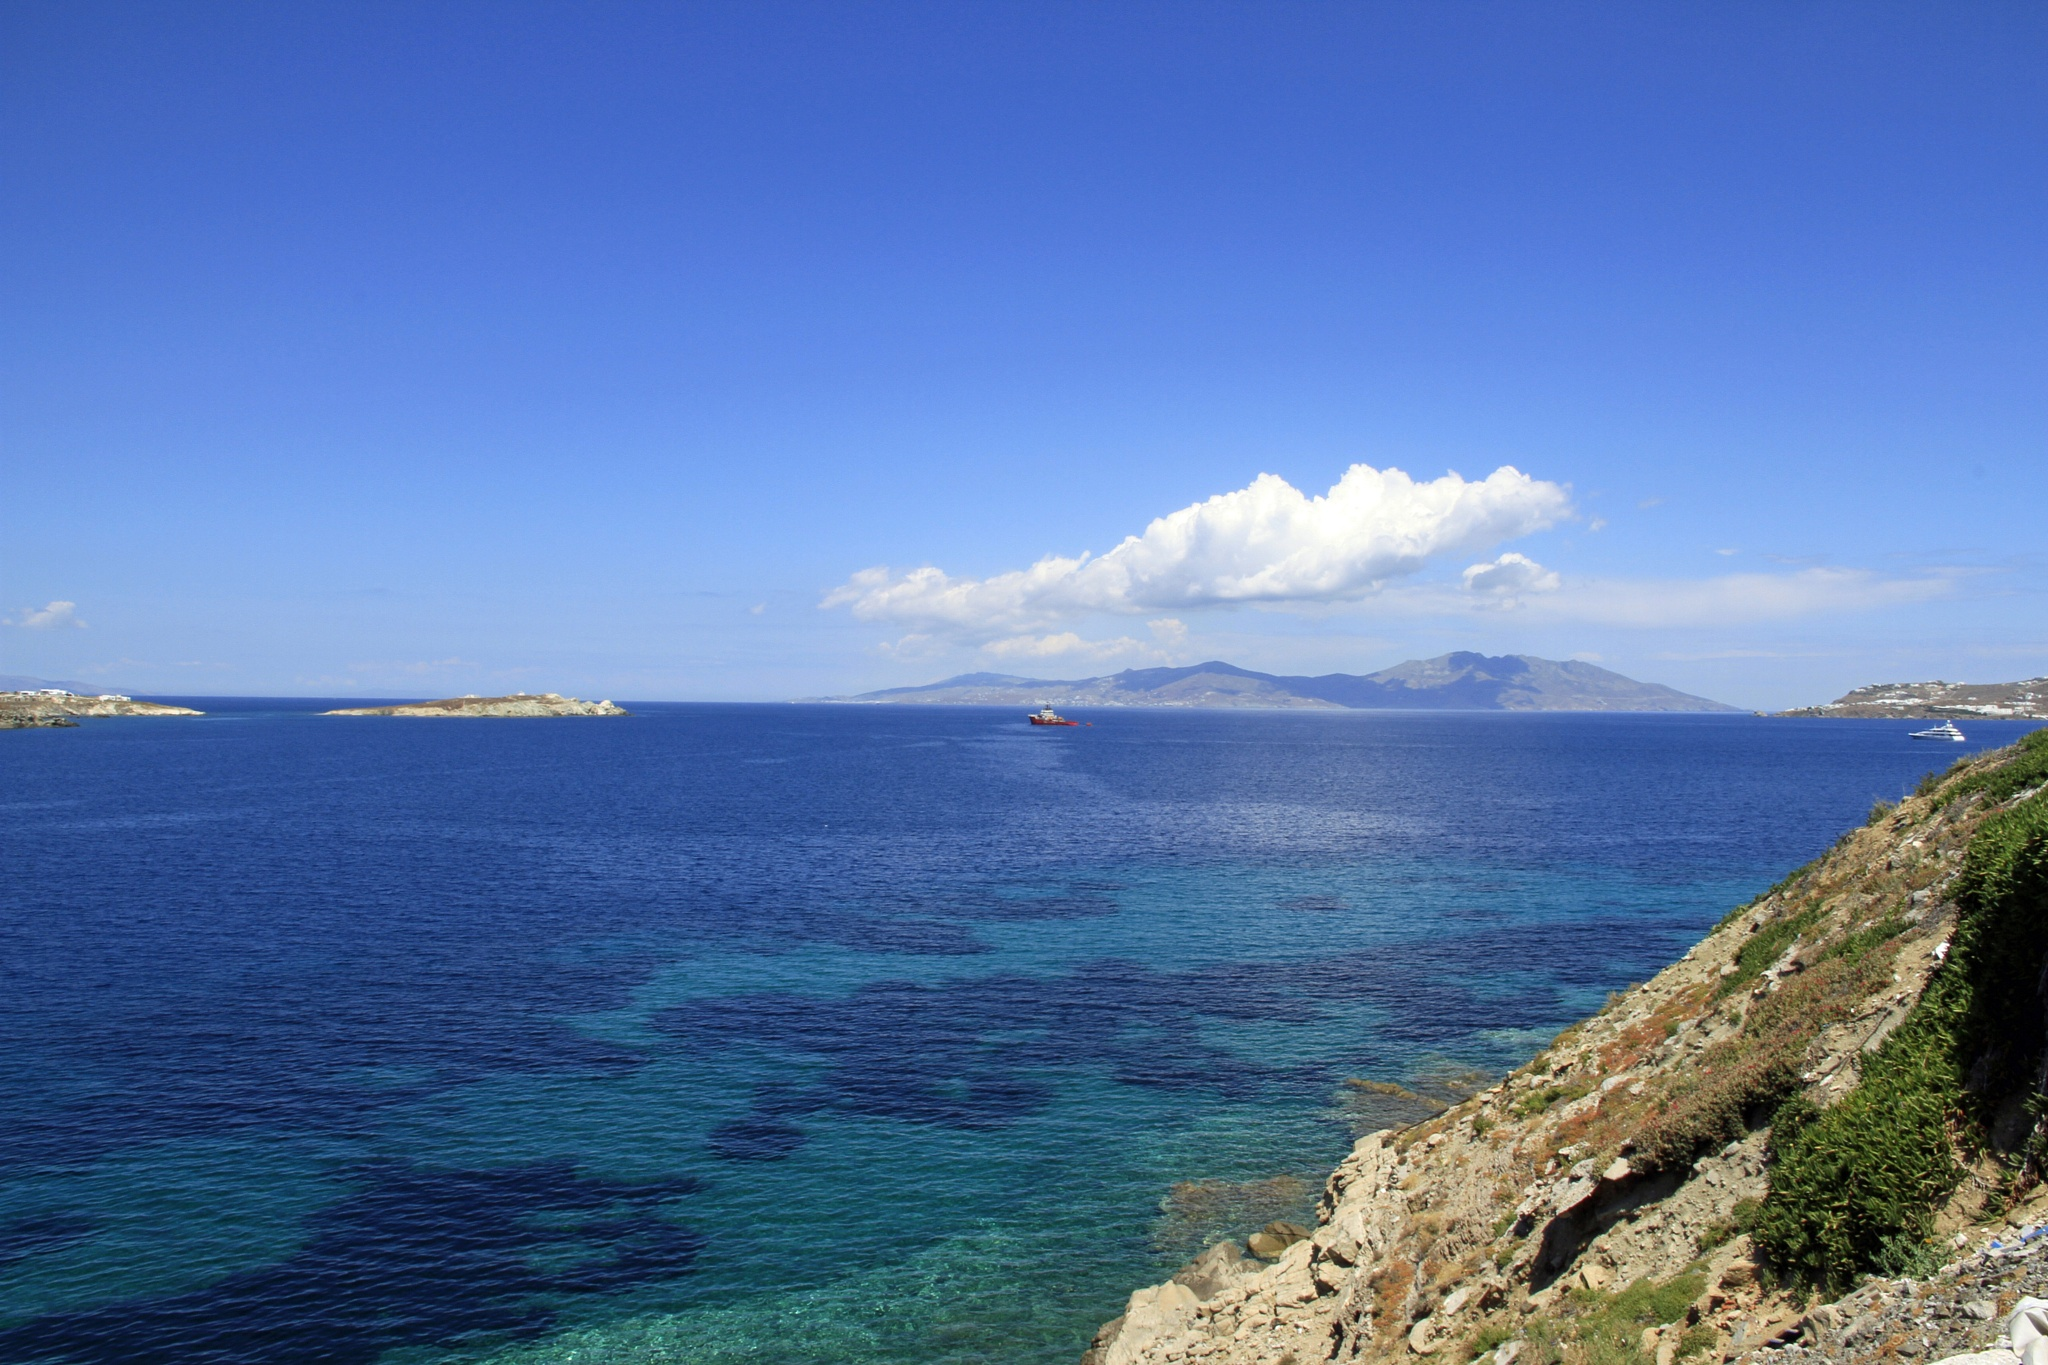 Blue Mykonos by Martin Roper